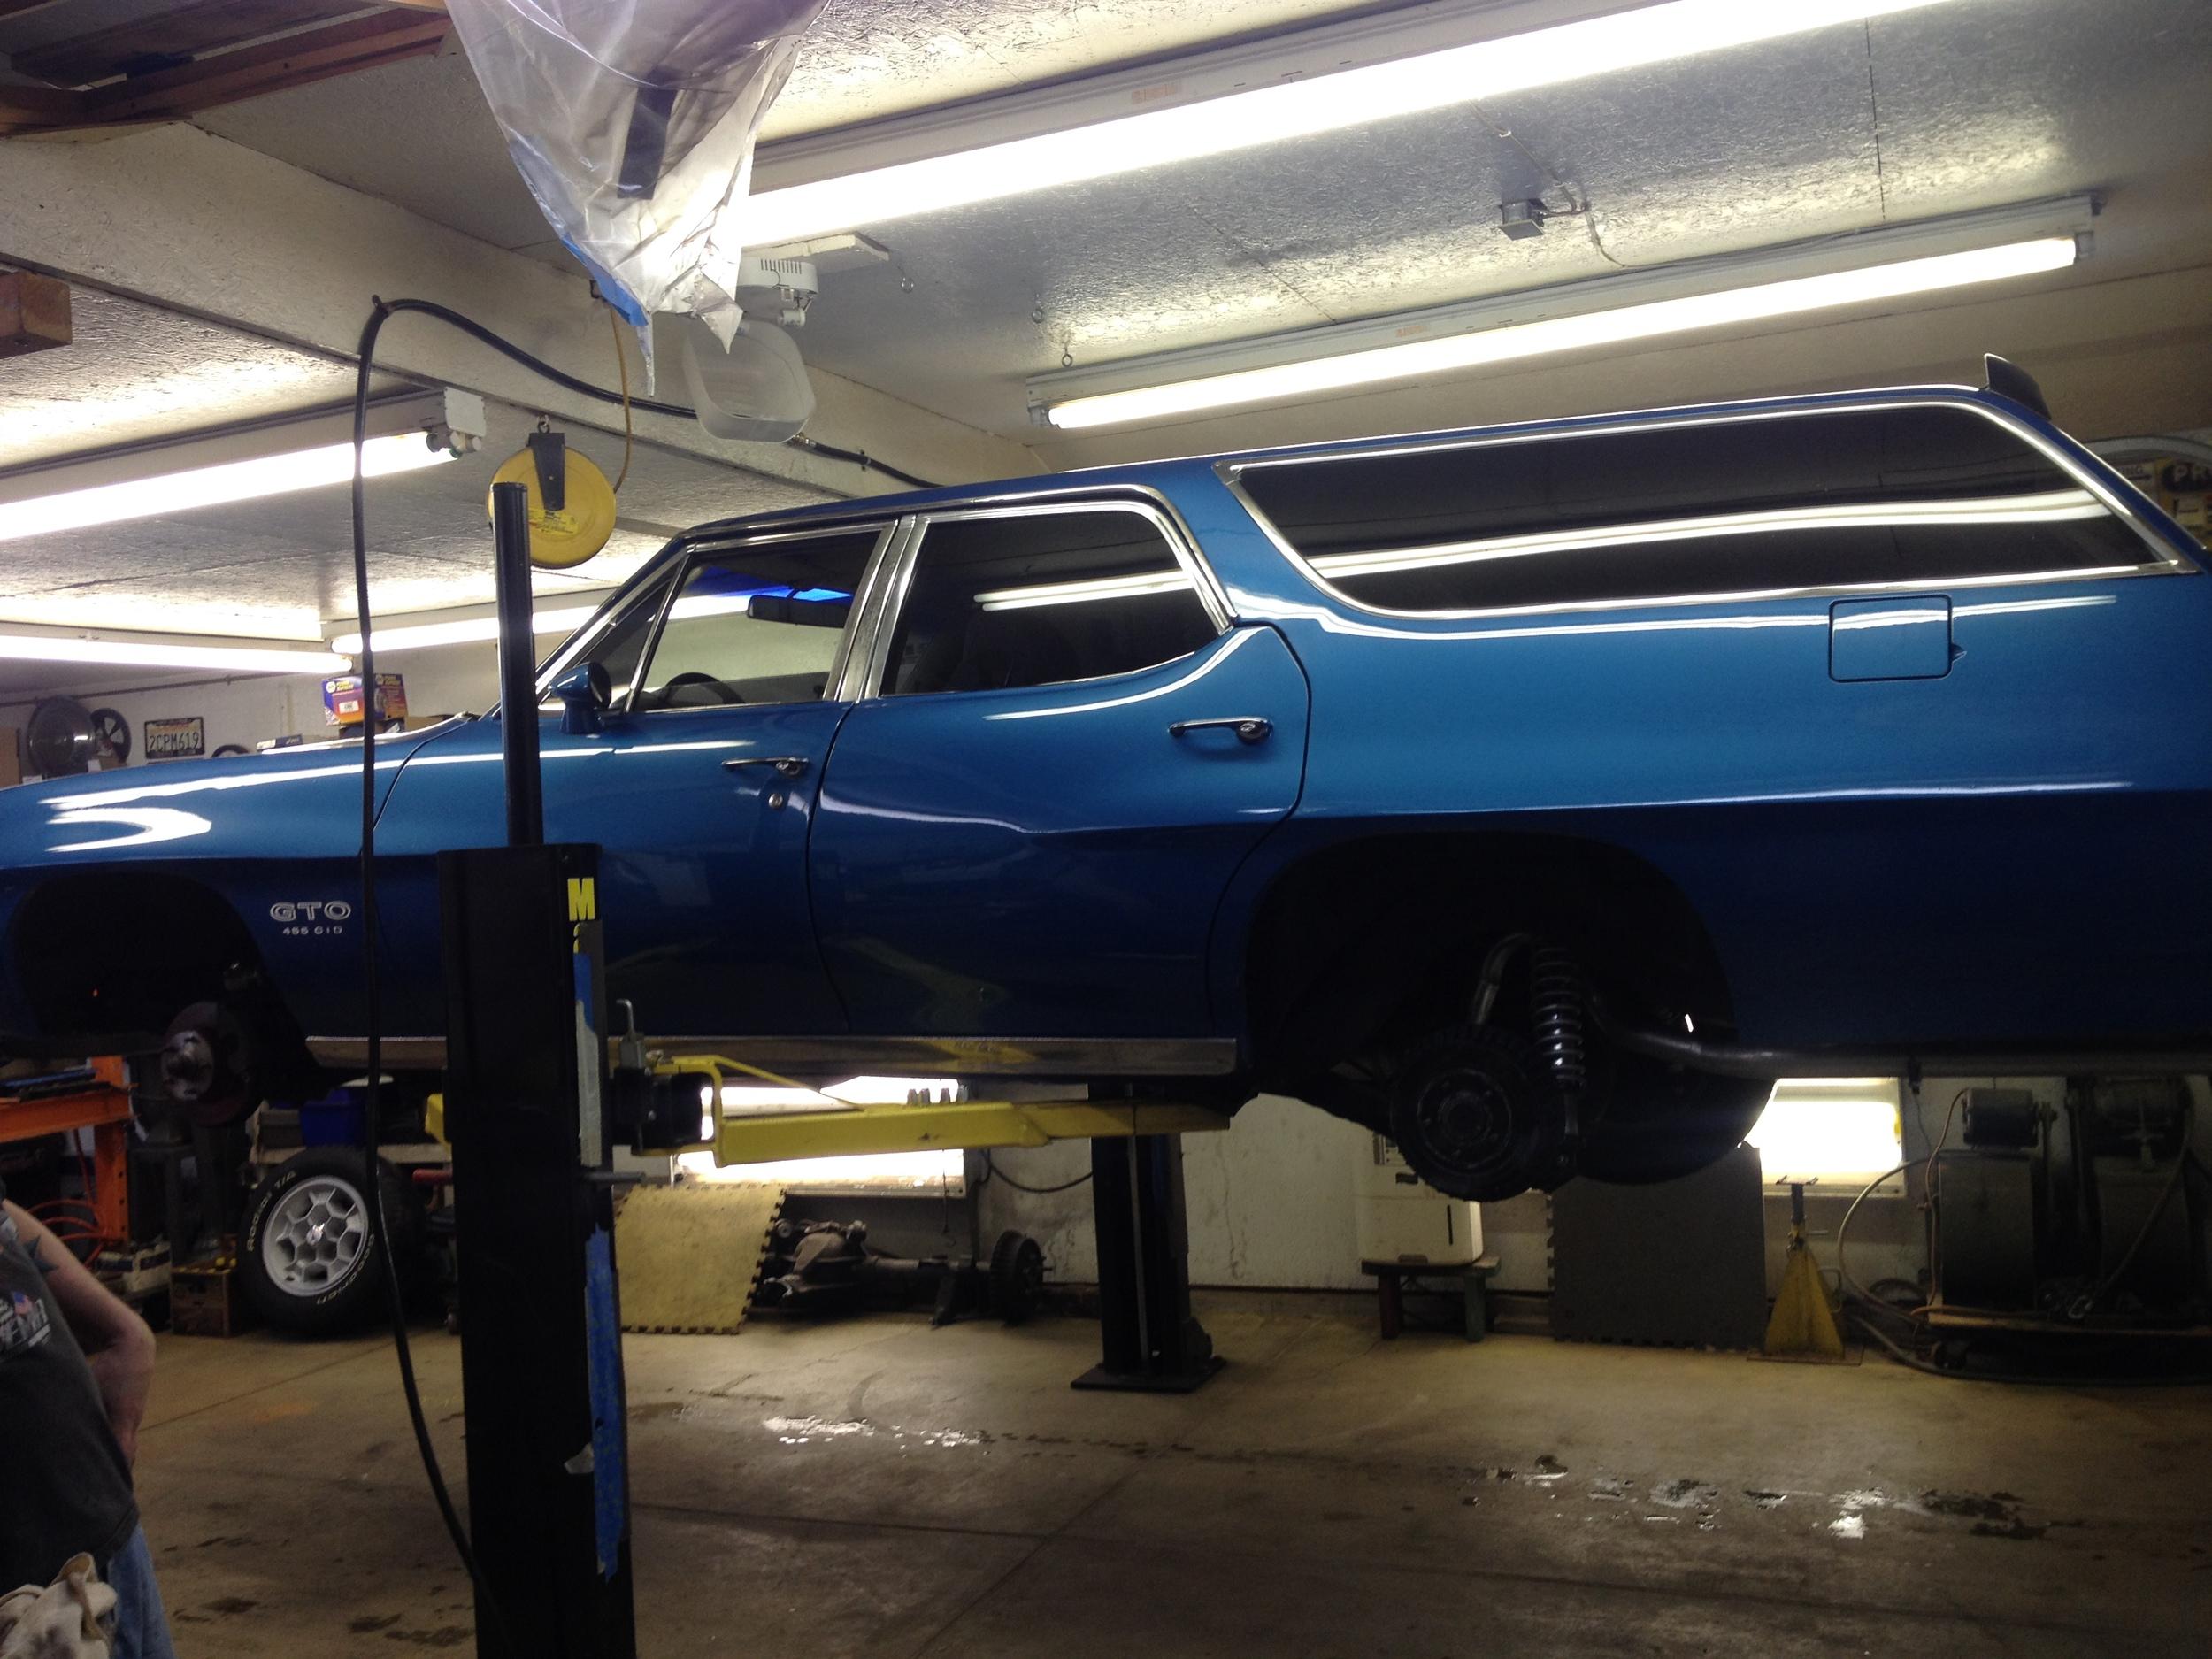 ON the hoist, wheels off, ready for work.